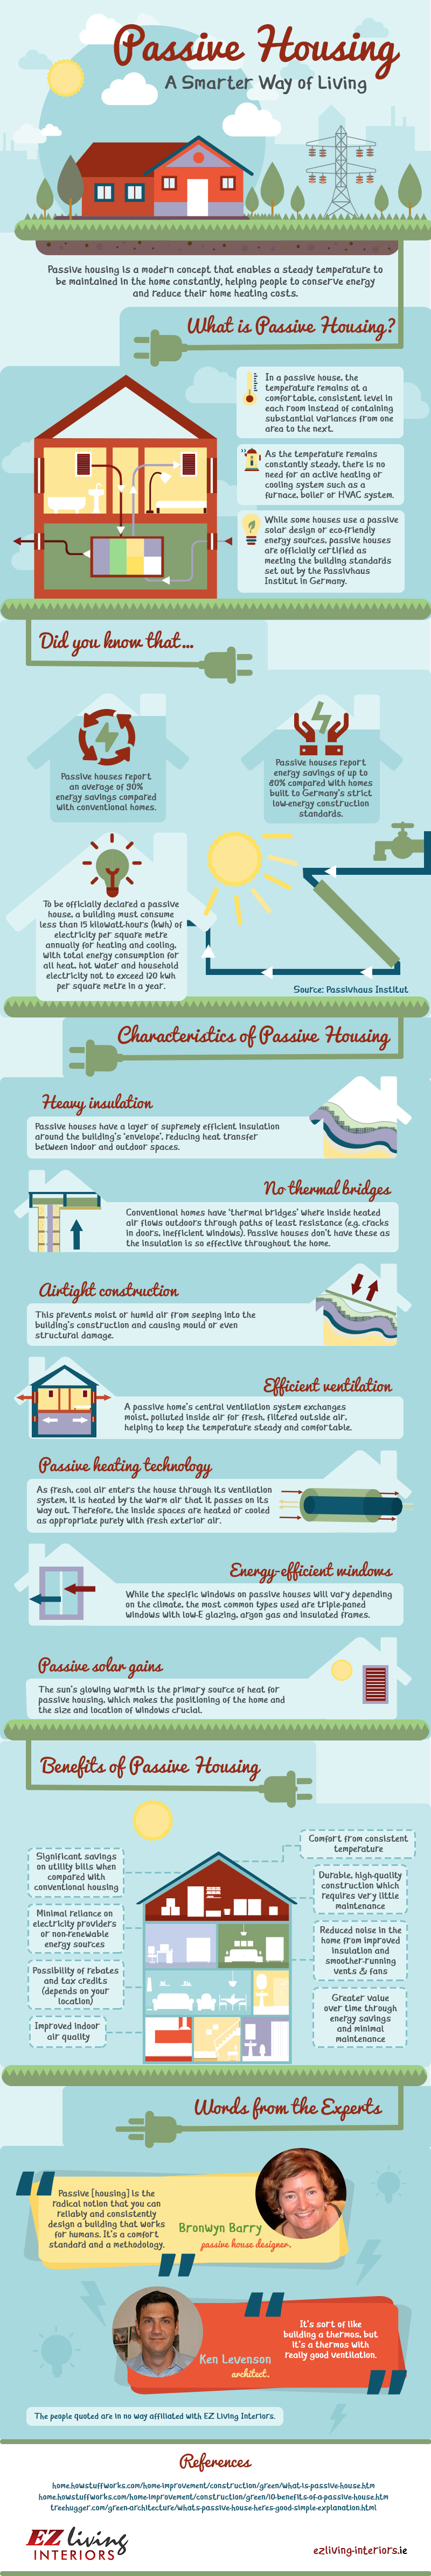 eco-friendly housing, passive housing